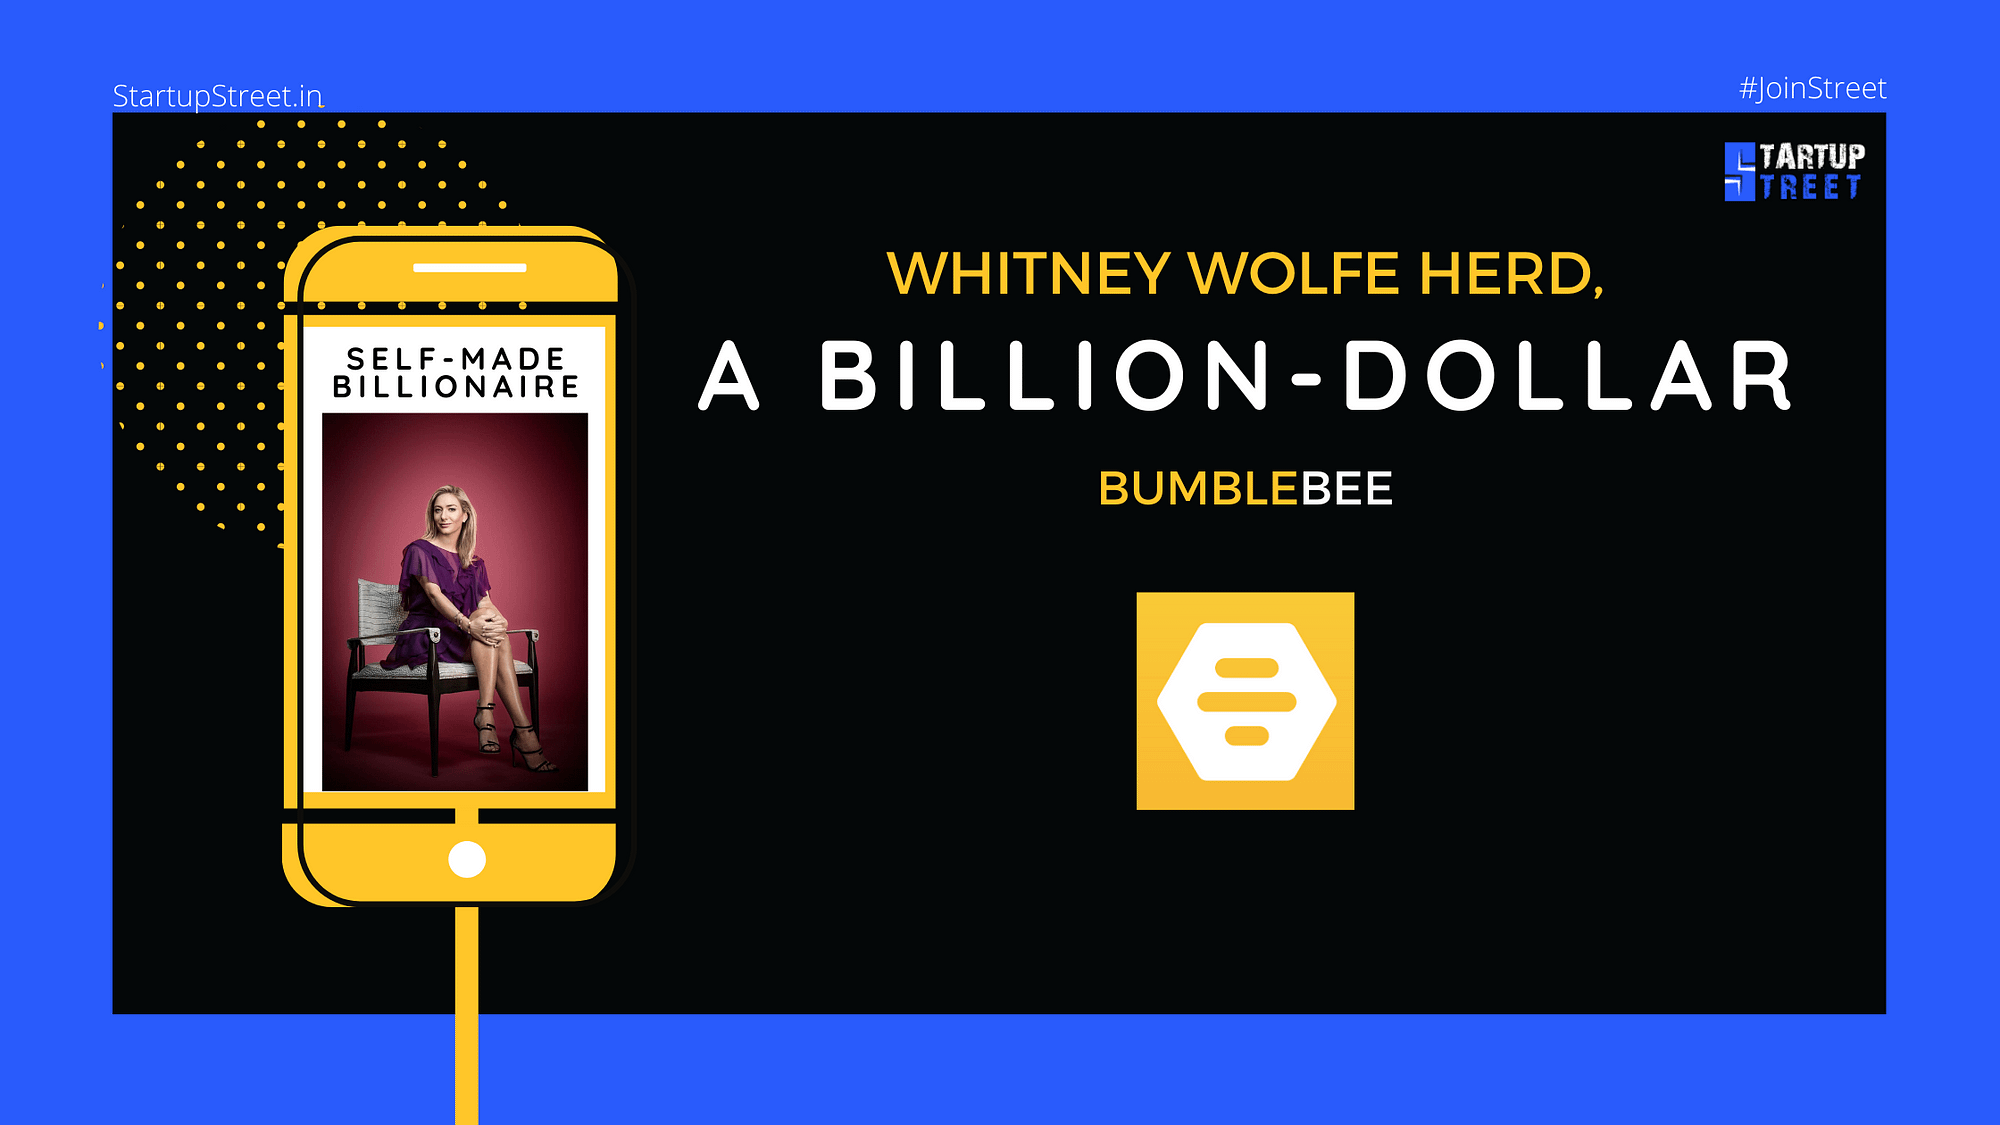 Billion-dollar bumblebee-Whitney Wolfe Herd-StartupStreet Blogs